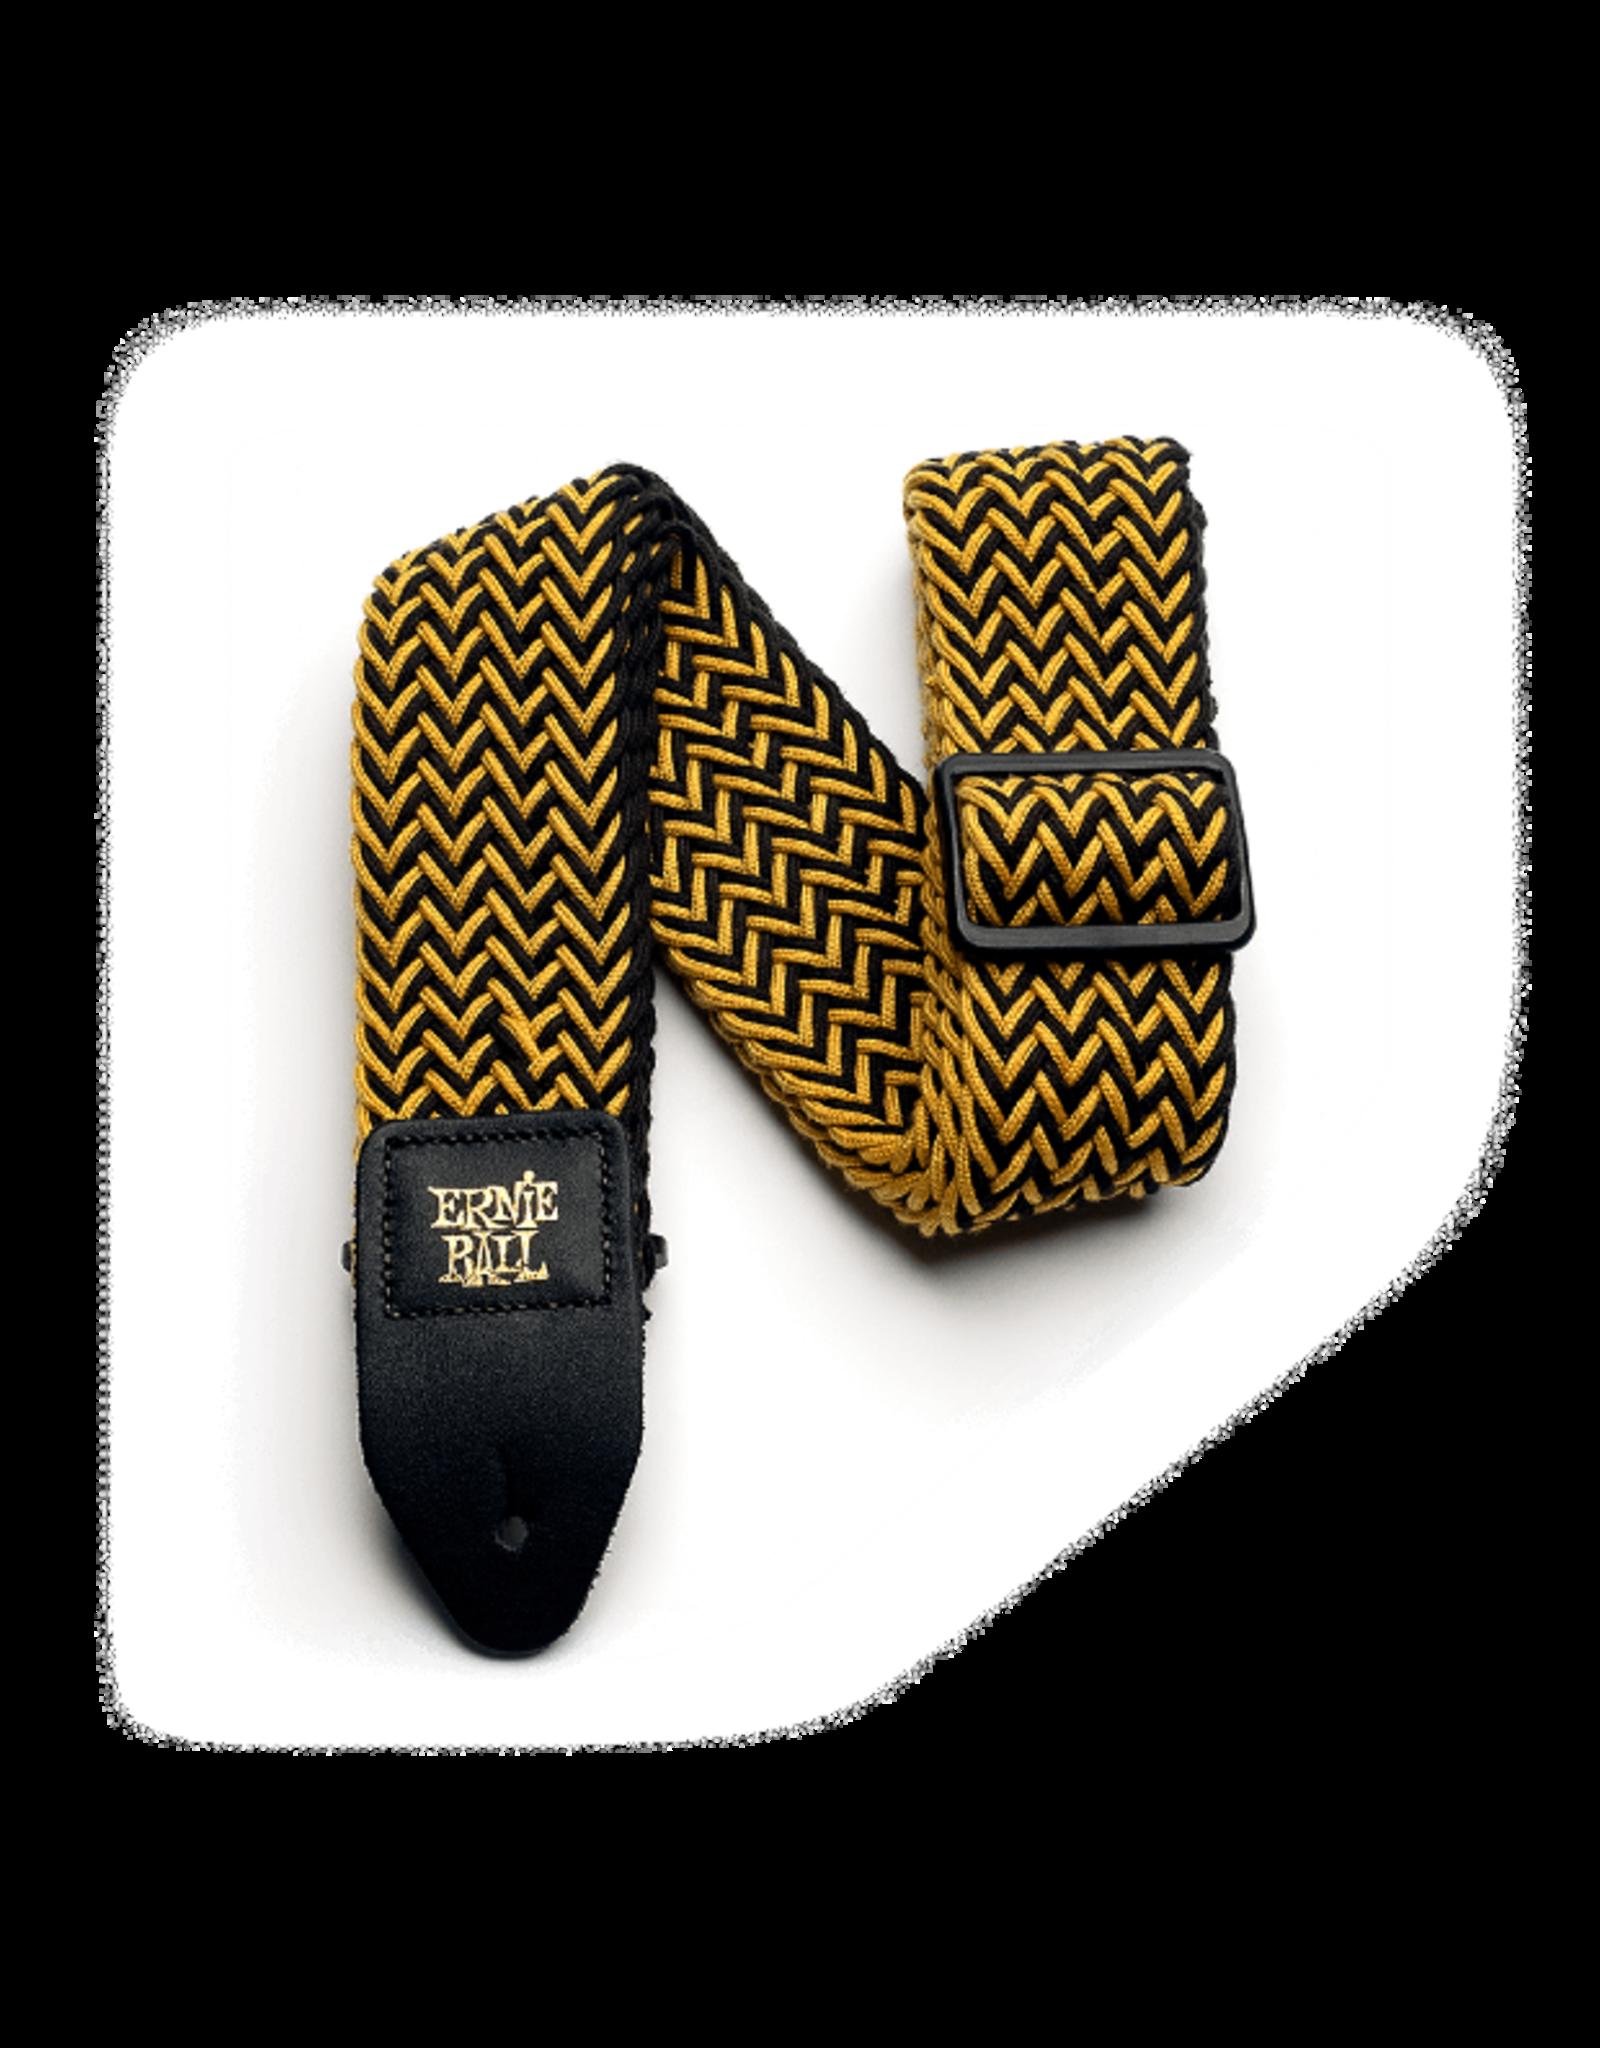 Ernie Ball Ernie Ball 4147 Yellow Jacket Polyspun Strap